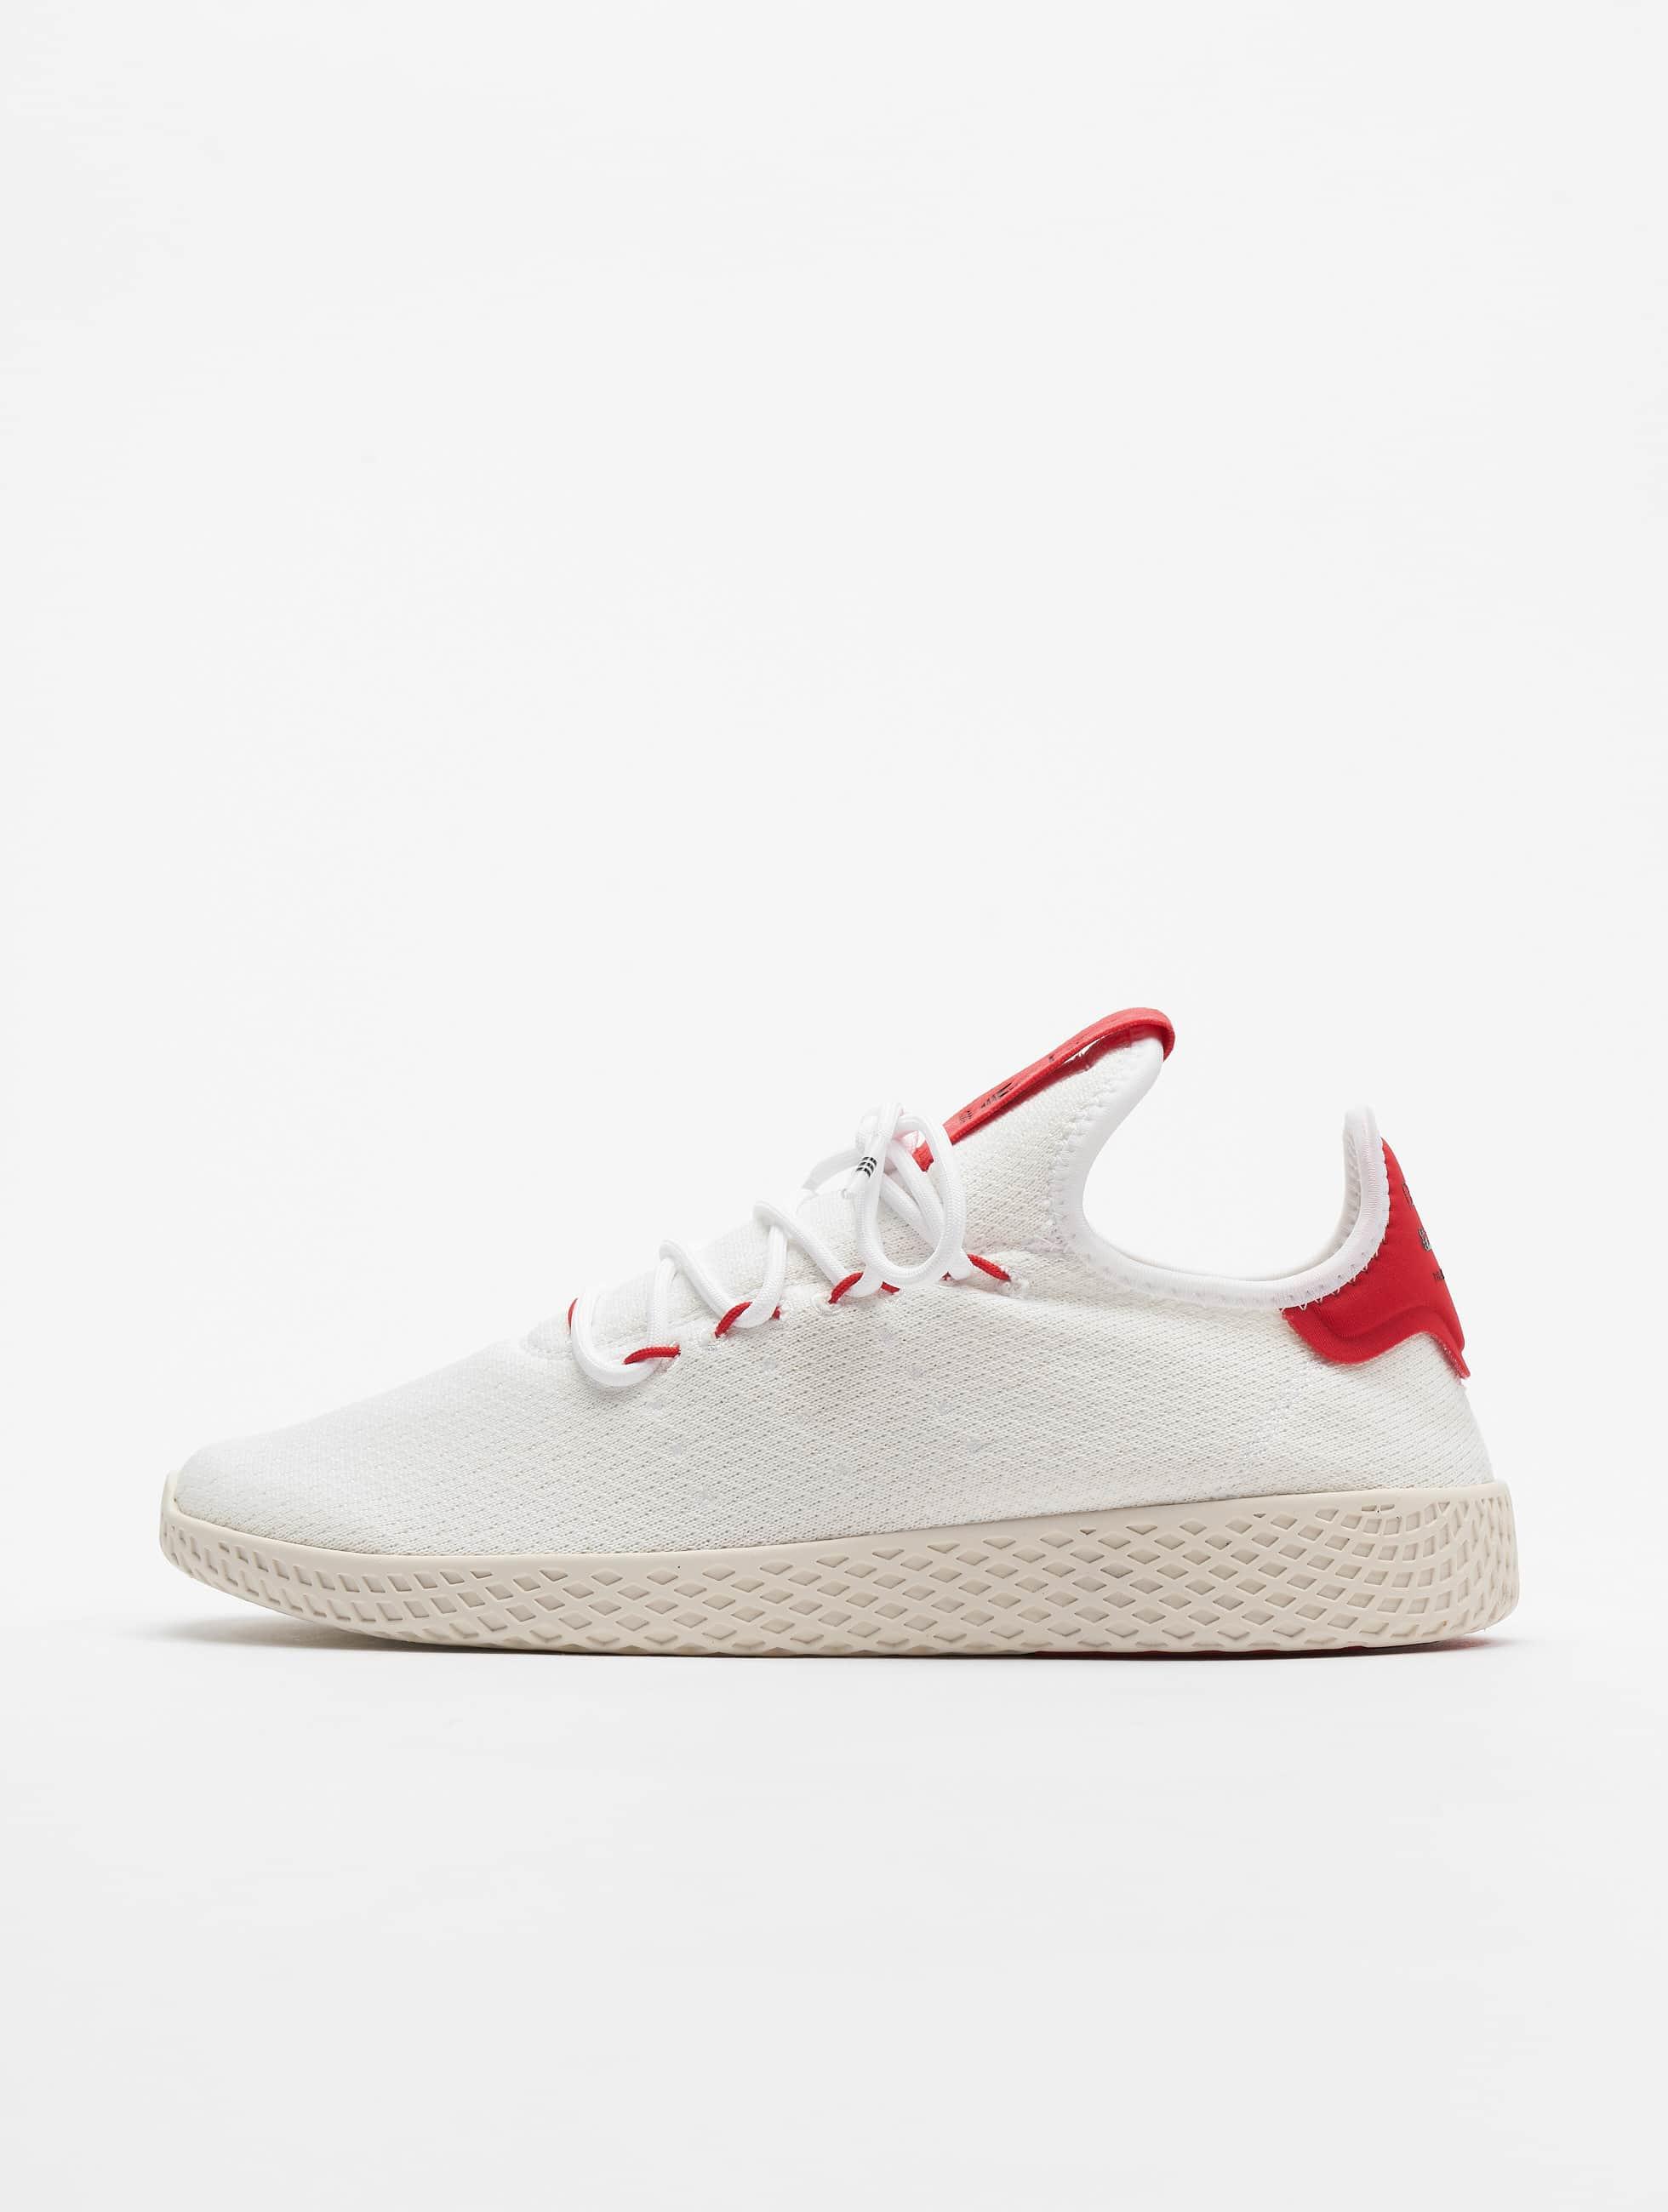 best value online store discount shop Adidas Originals Pw Tennis Hu Sneakers Ftw White/Scarlet/Core White